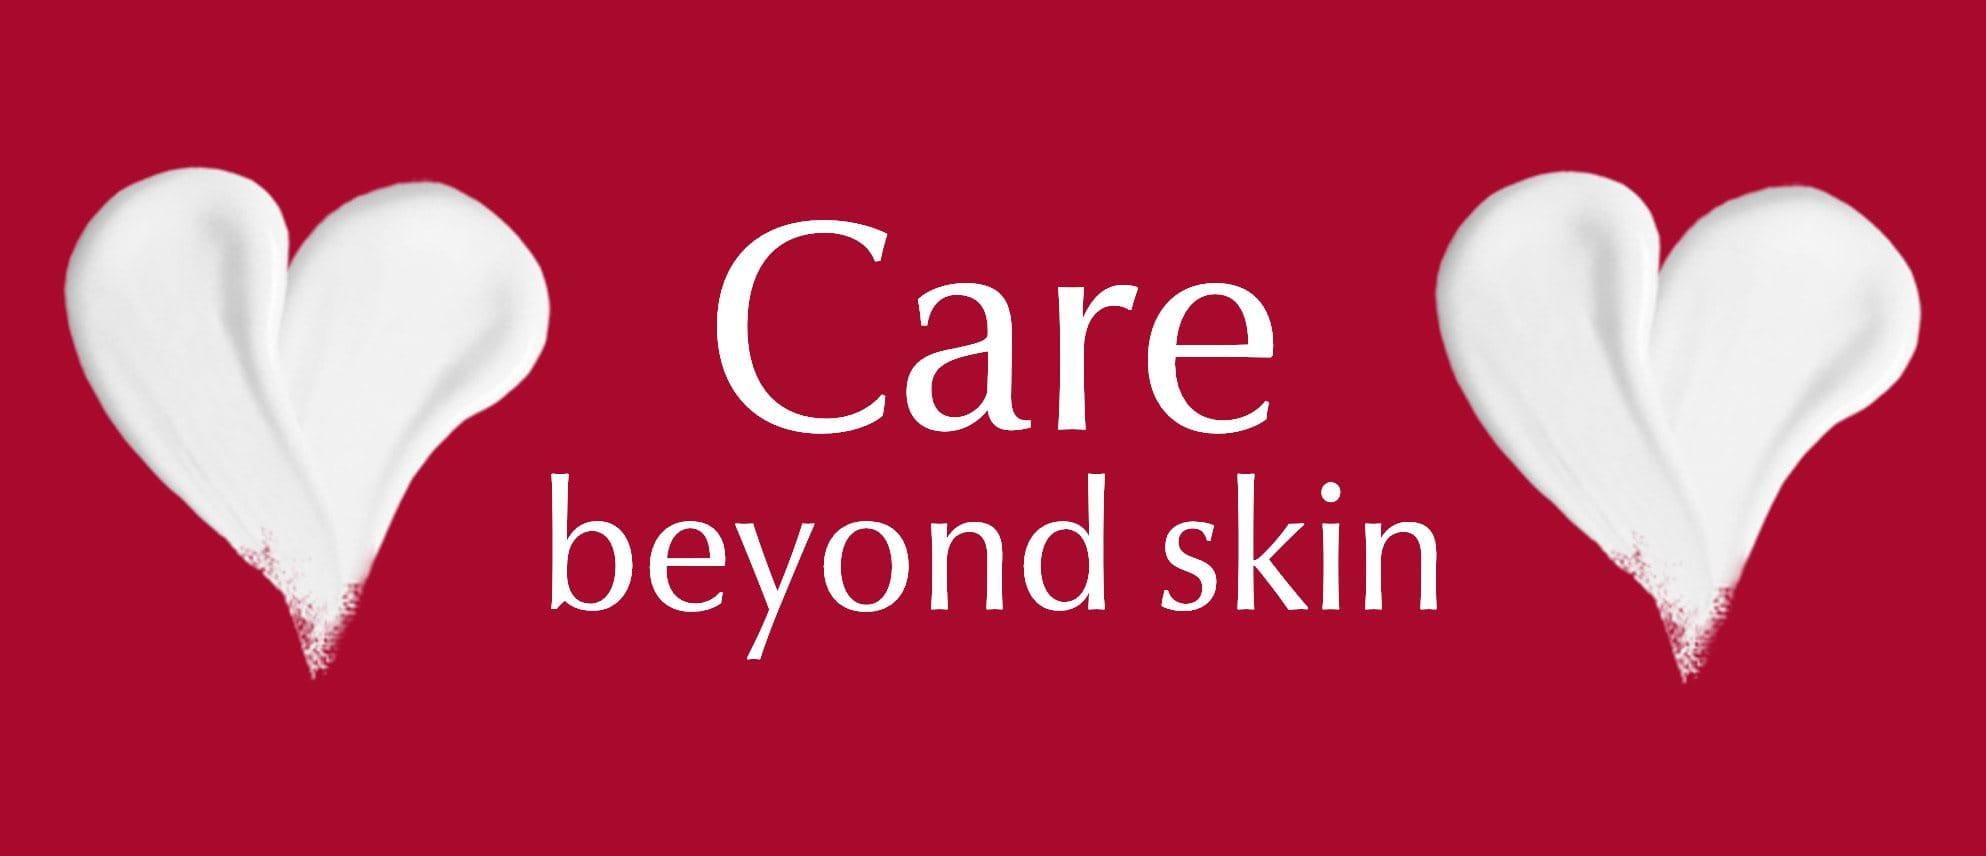 Care beyond skin